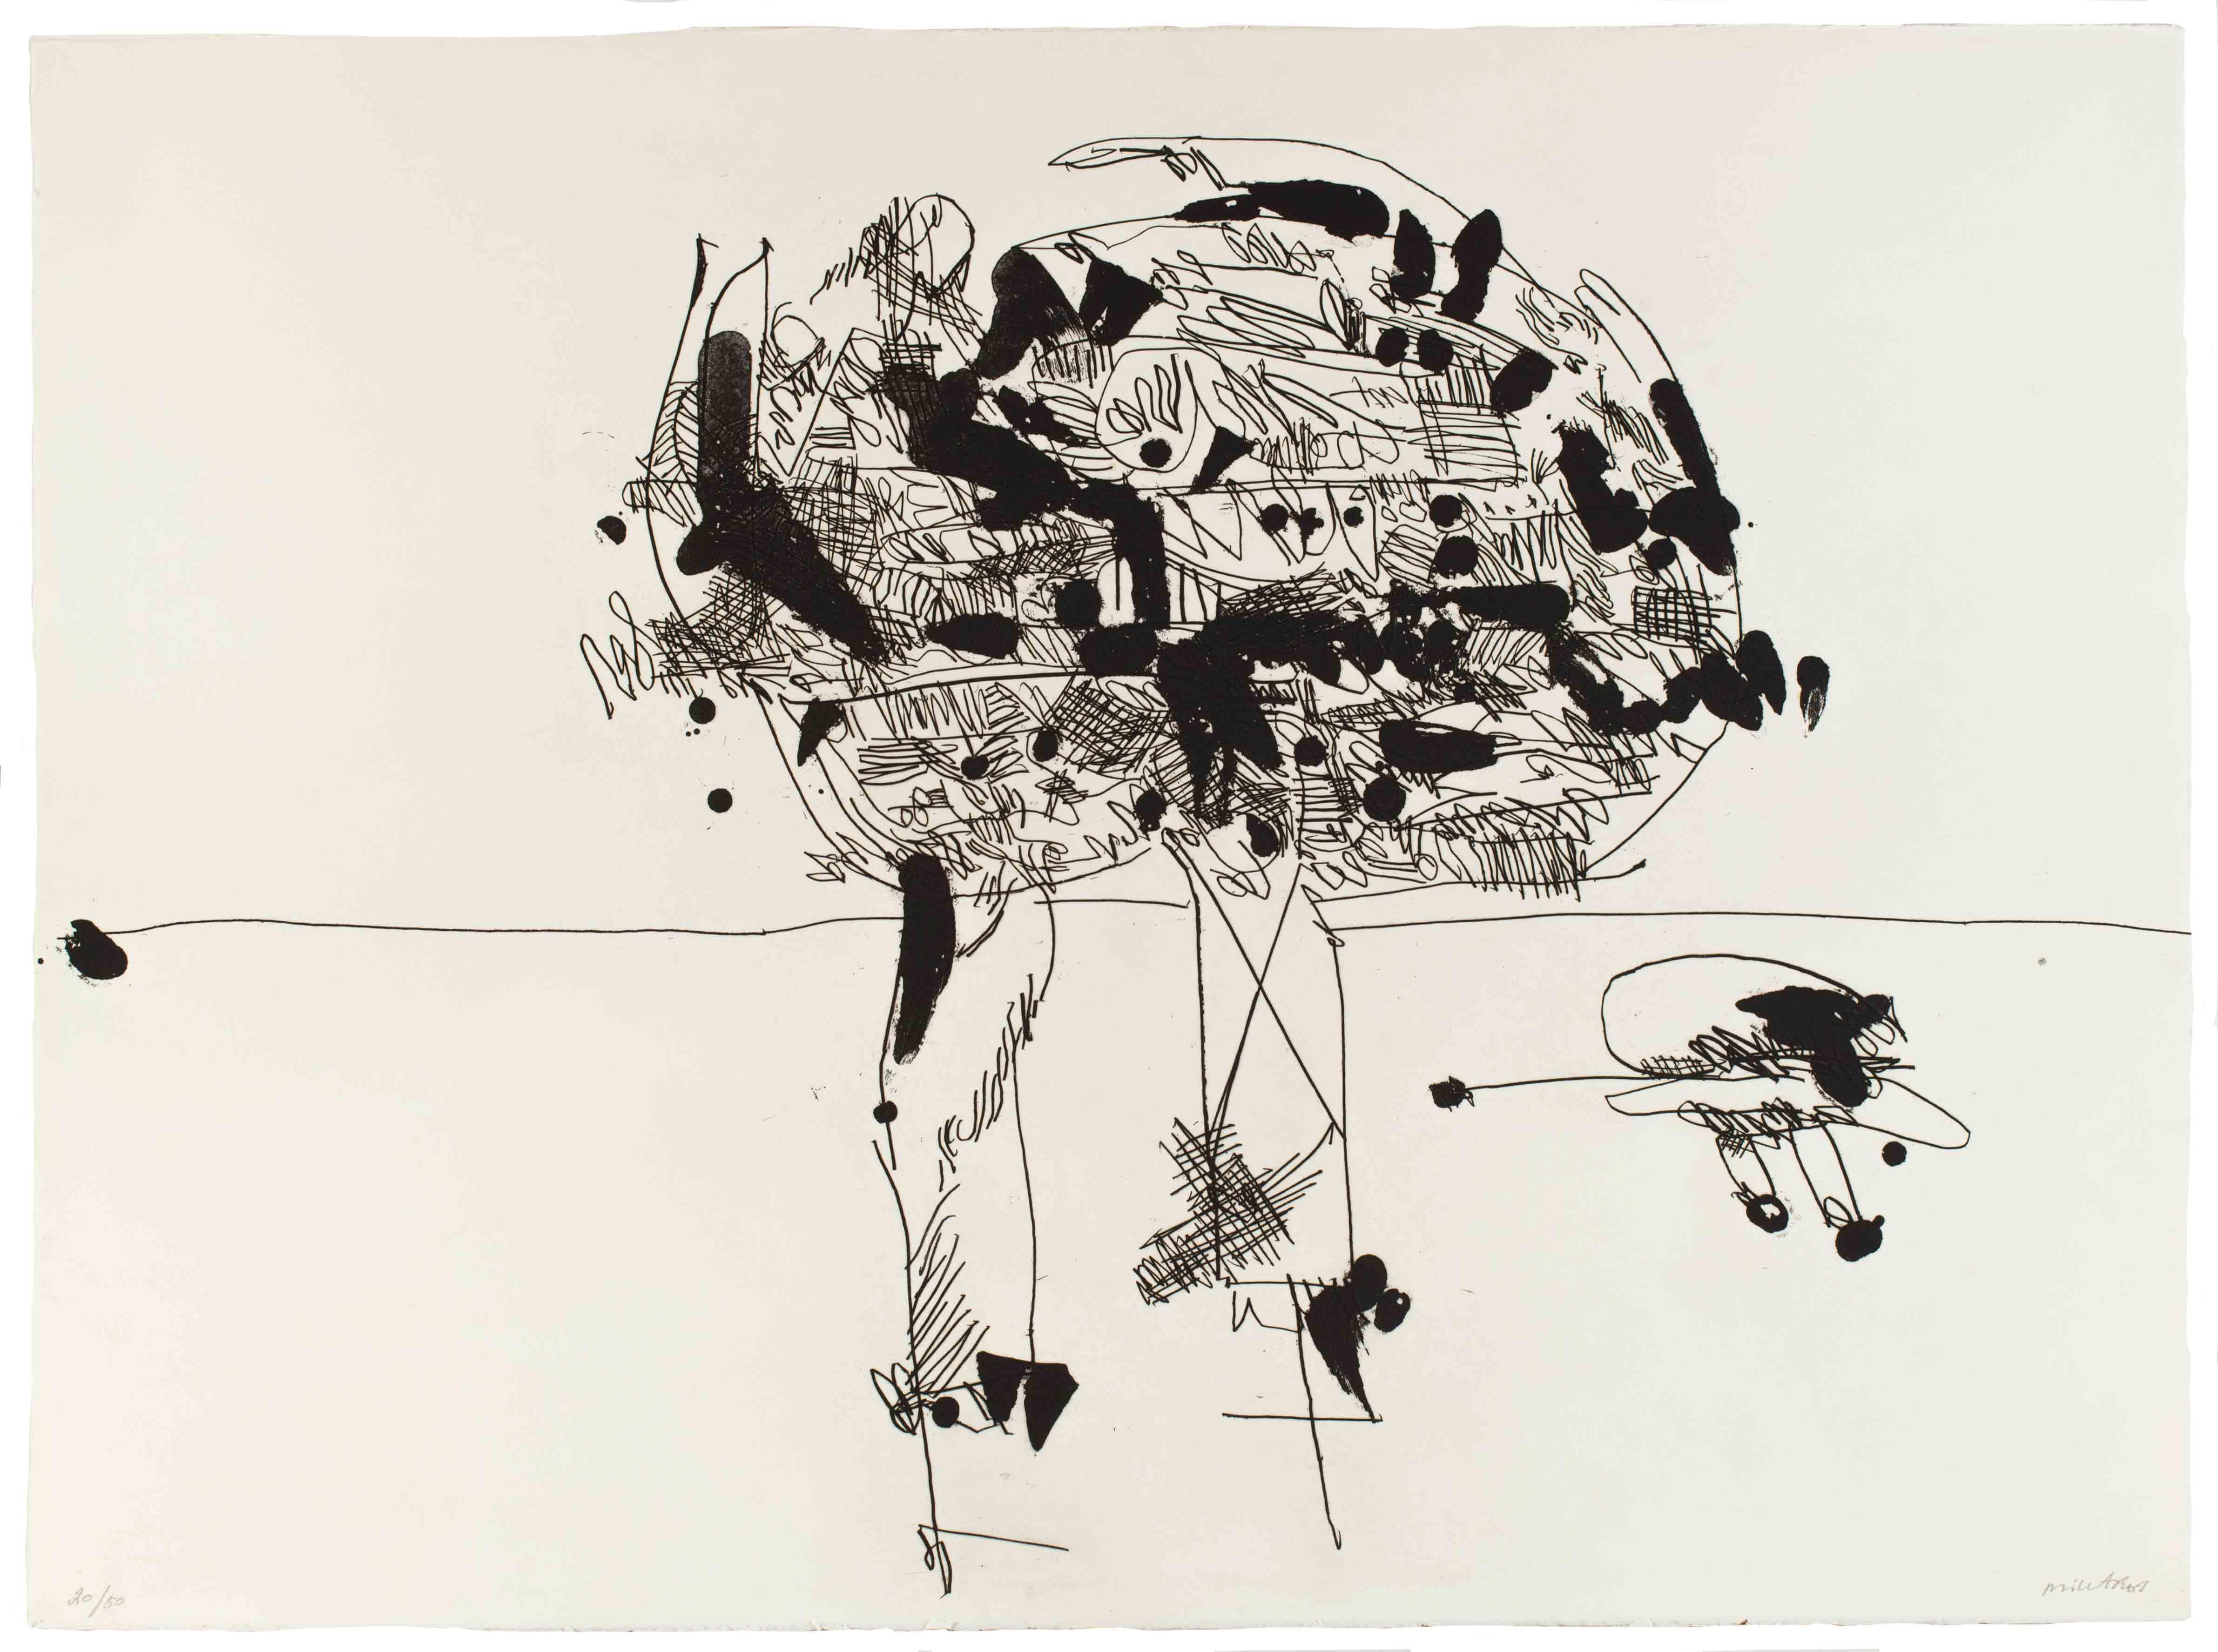 Manolo Millares (1926-1972). Antropofauna. 1970.